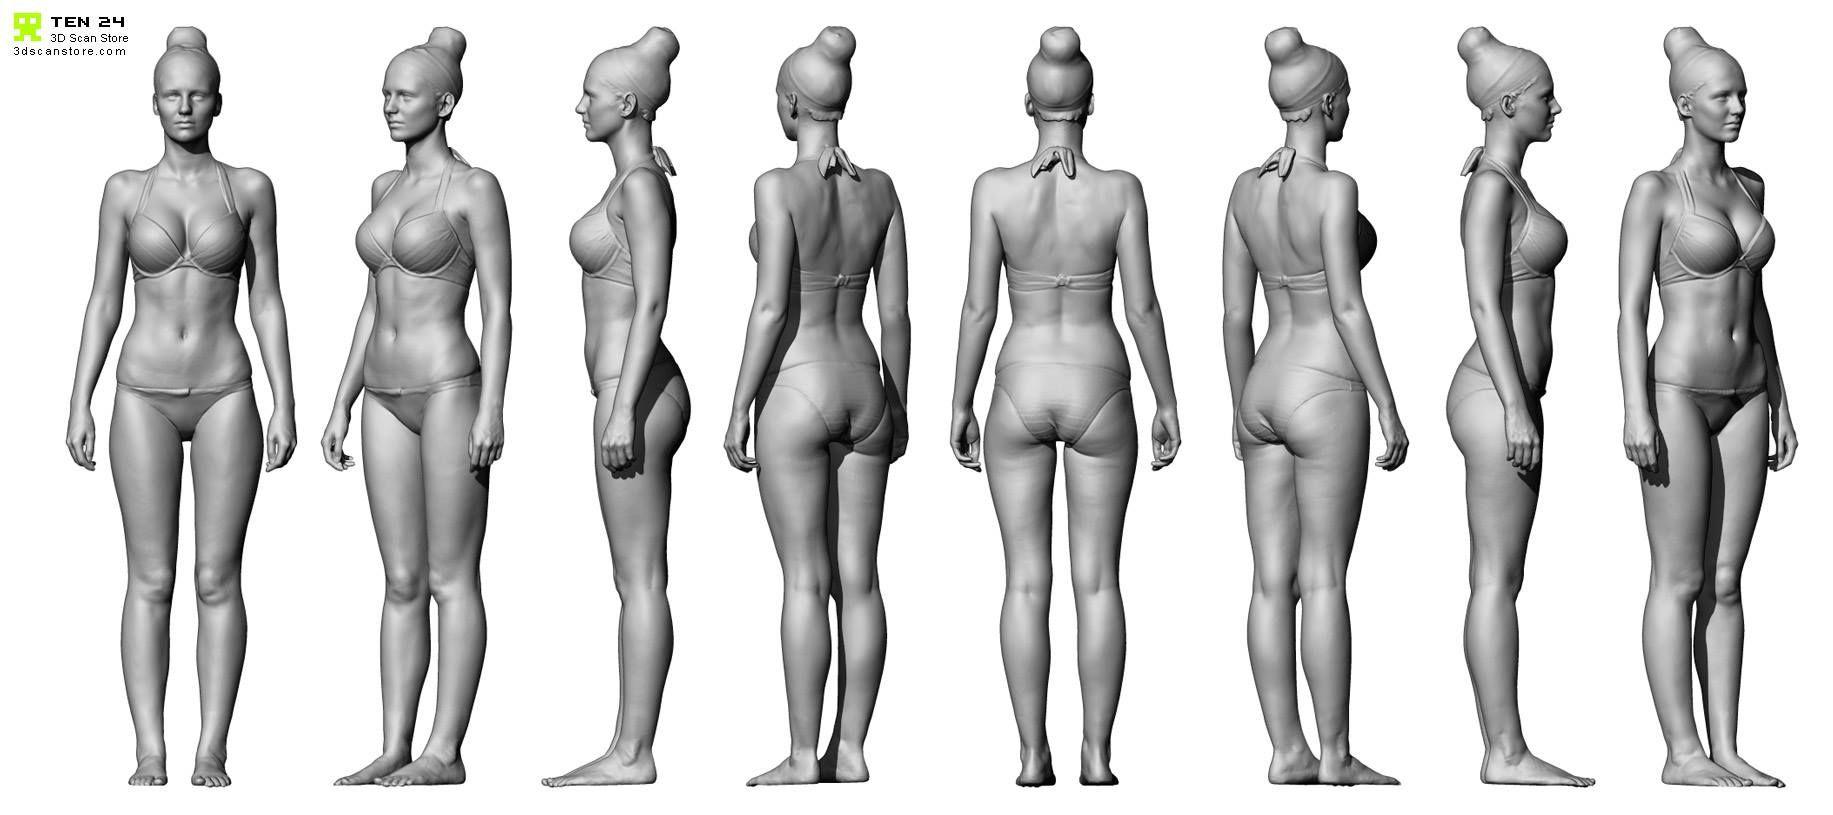 3d.sk Christmas Scan   Scan Models   Pinterest